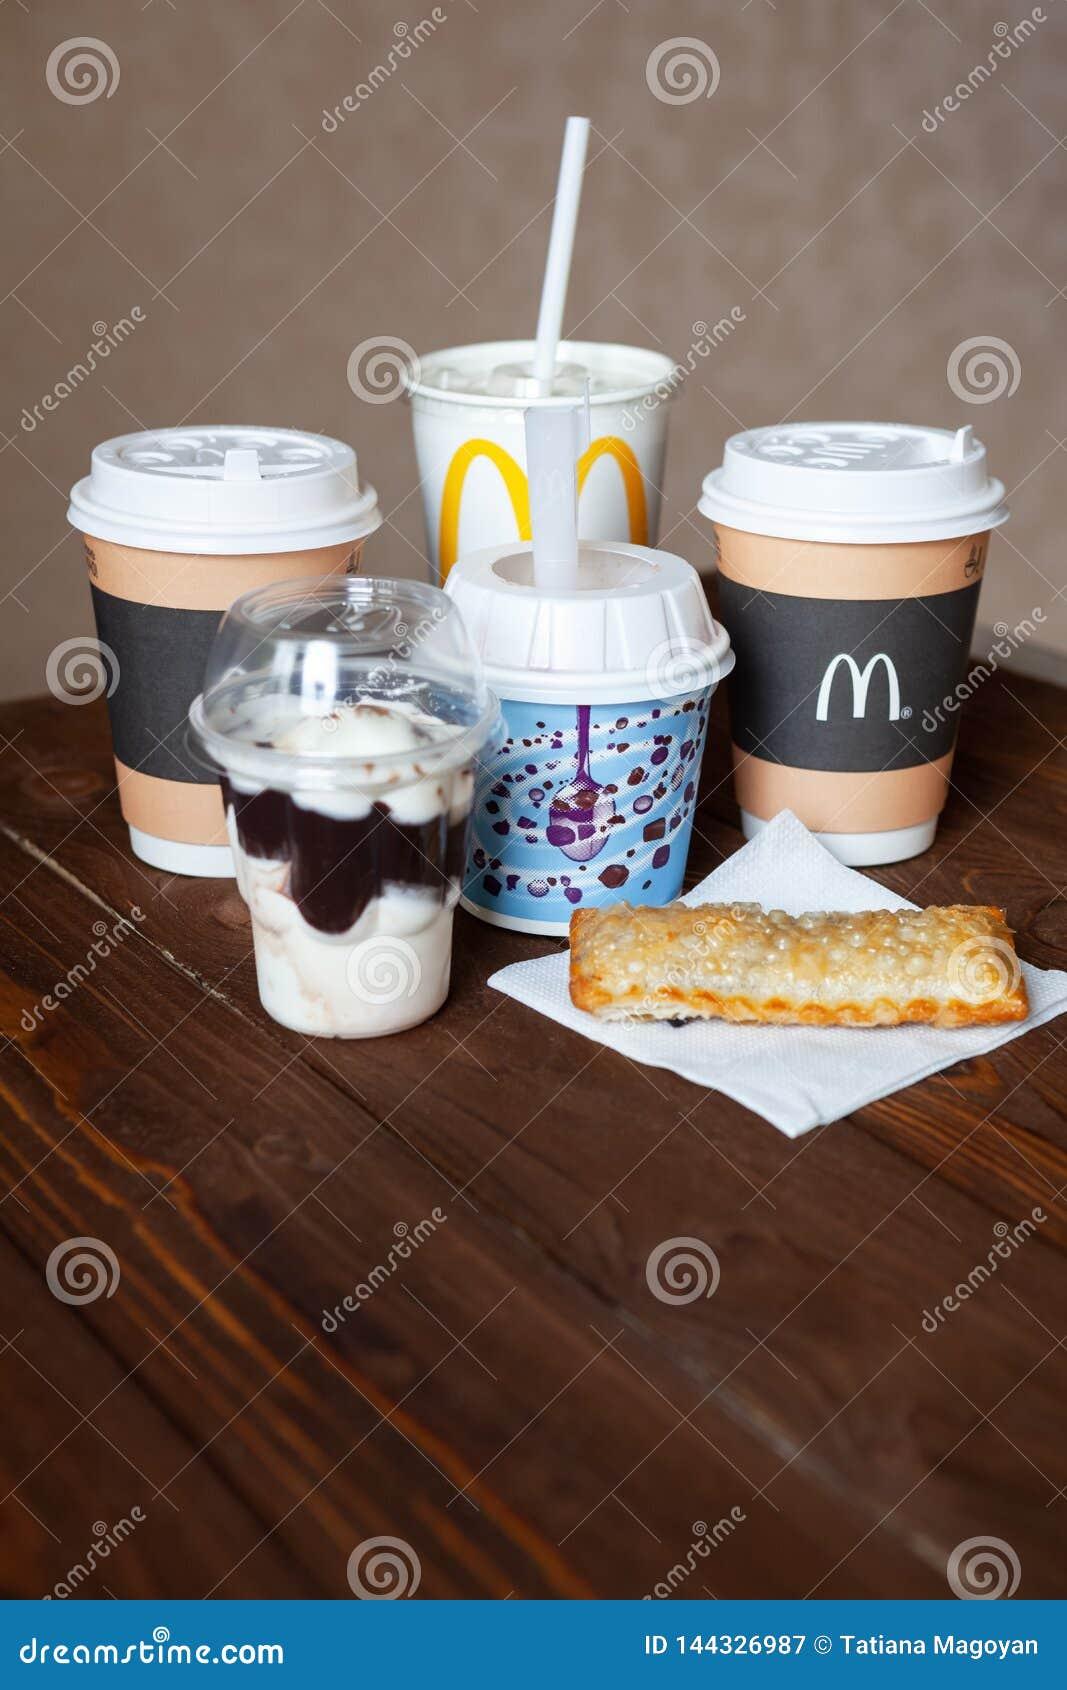 Moscú, Rusia - 6 de abril de 2019: Entrega de la comida de mcdonald Postres y bebidas calientes en la tabla de madera Primer Vist